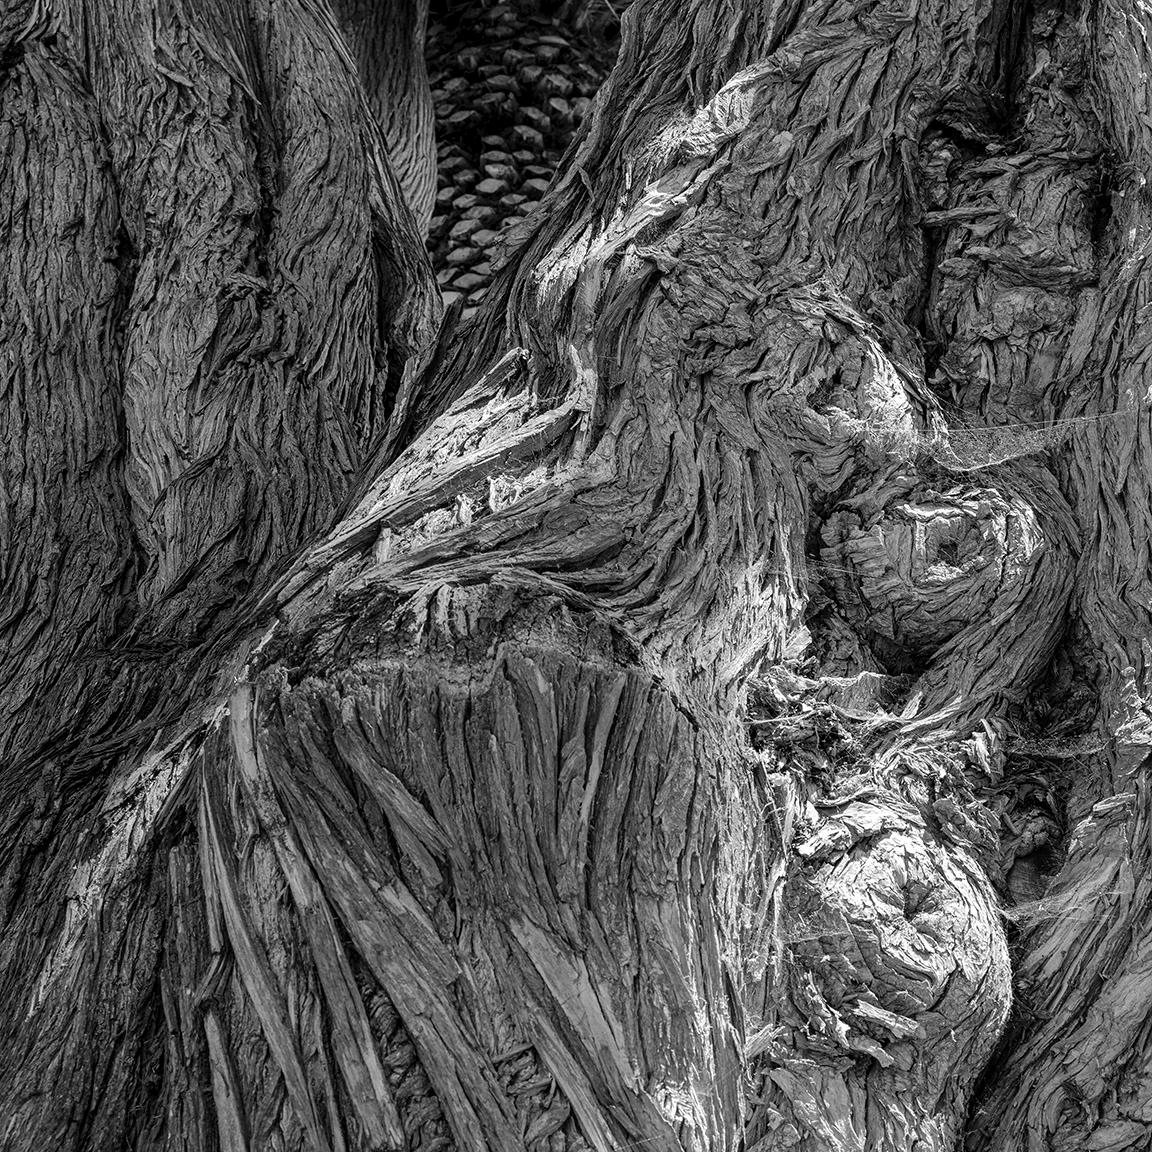 tree detail, Carpenteria, Calif - frankfosterphotography   ello